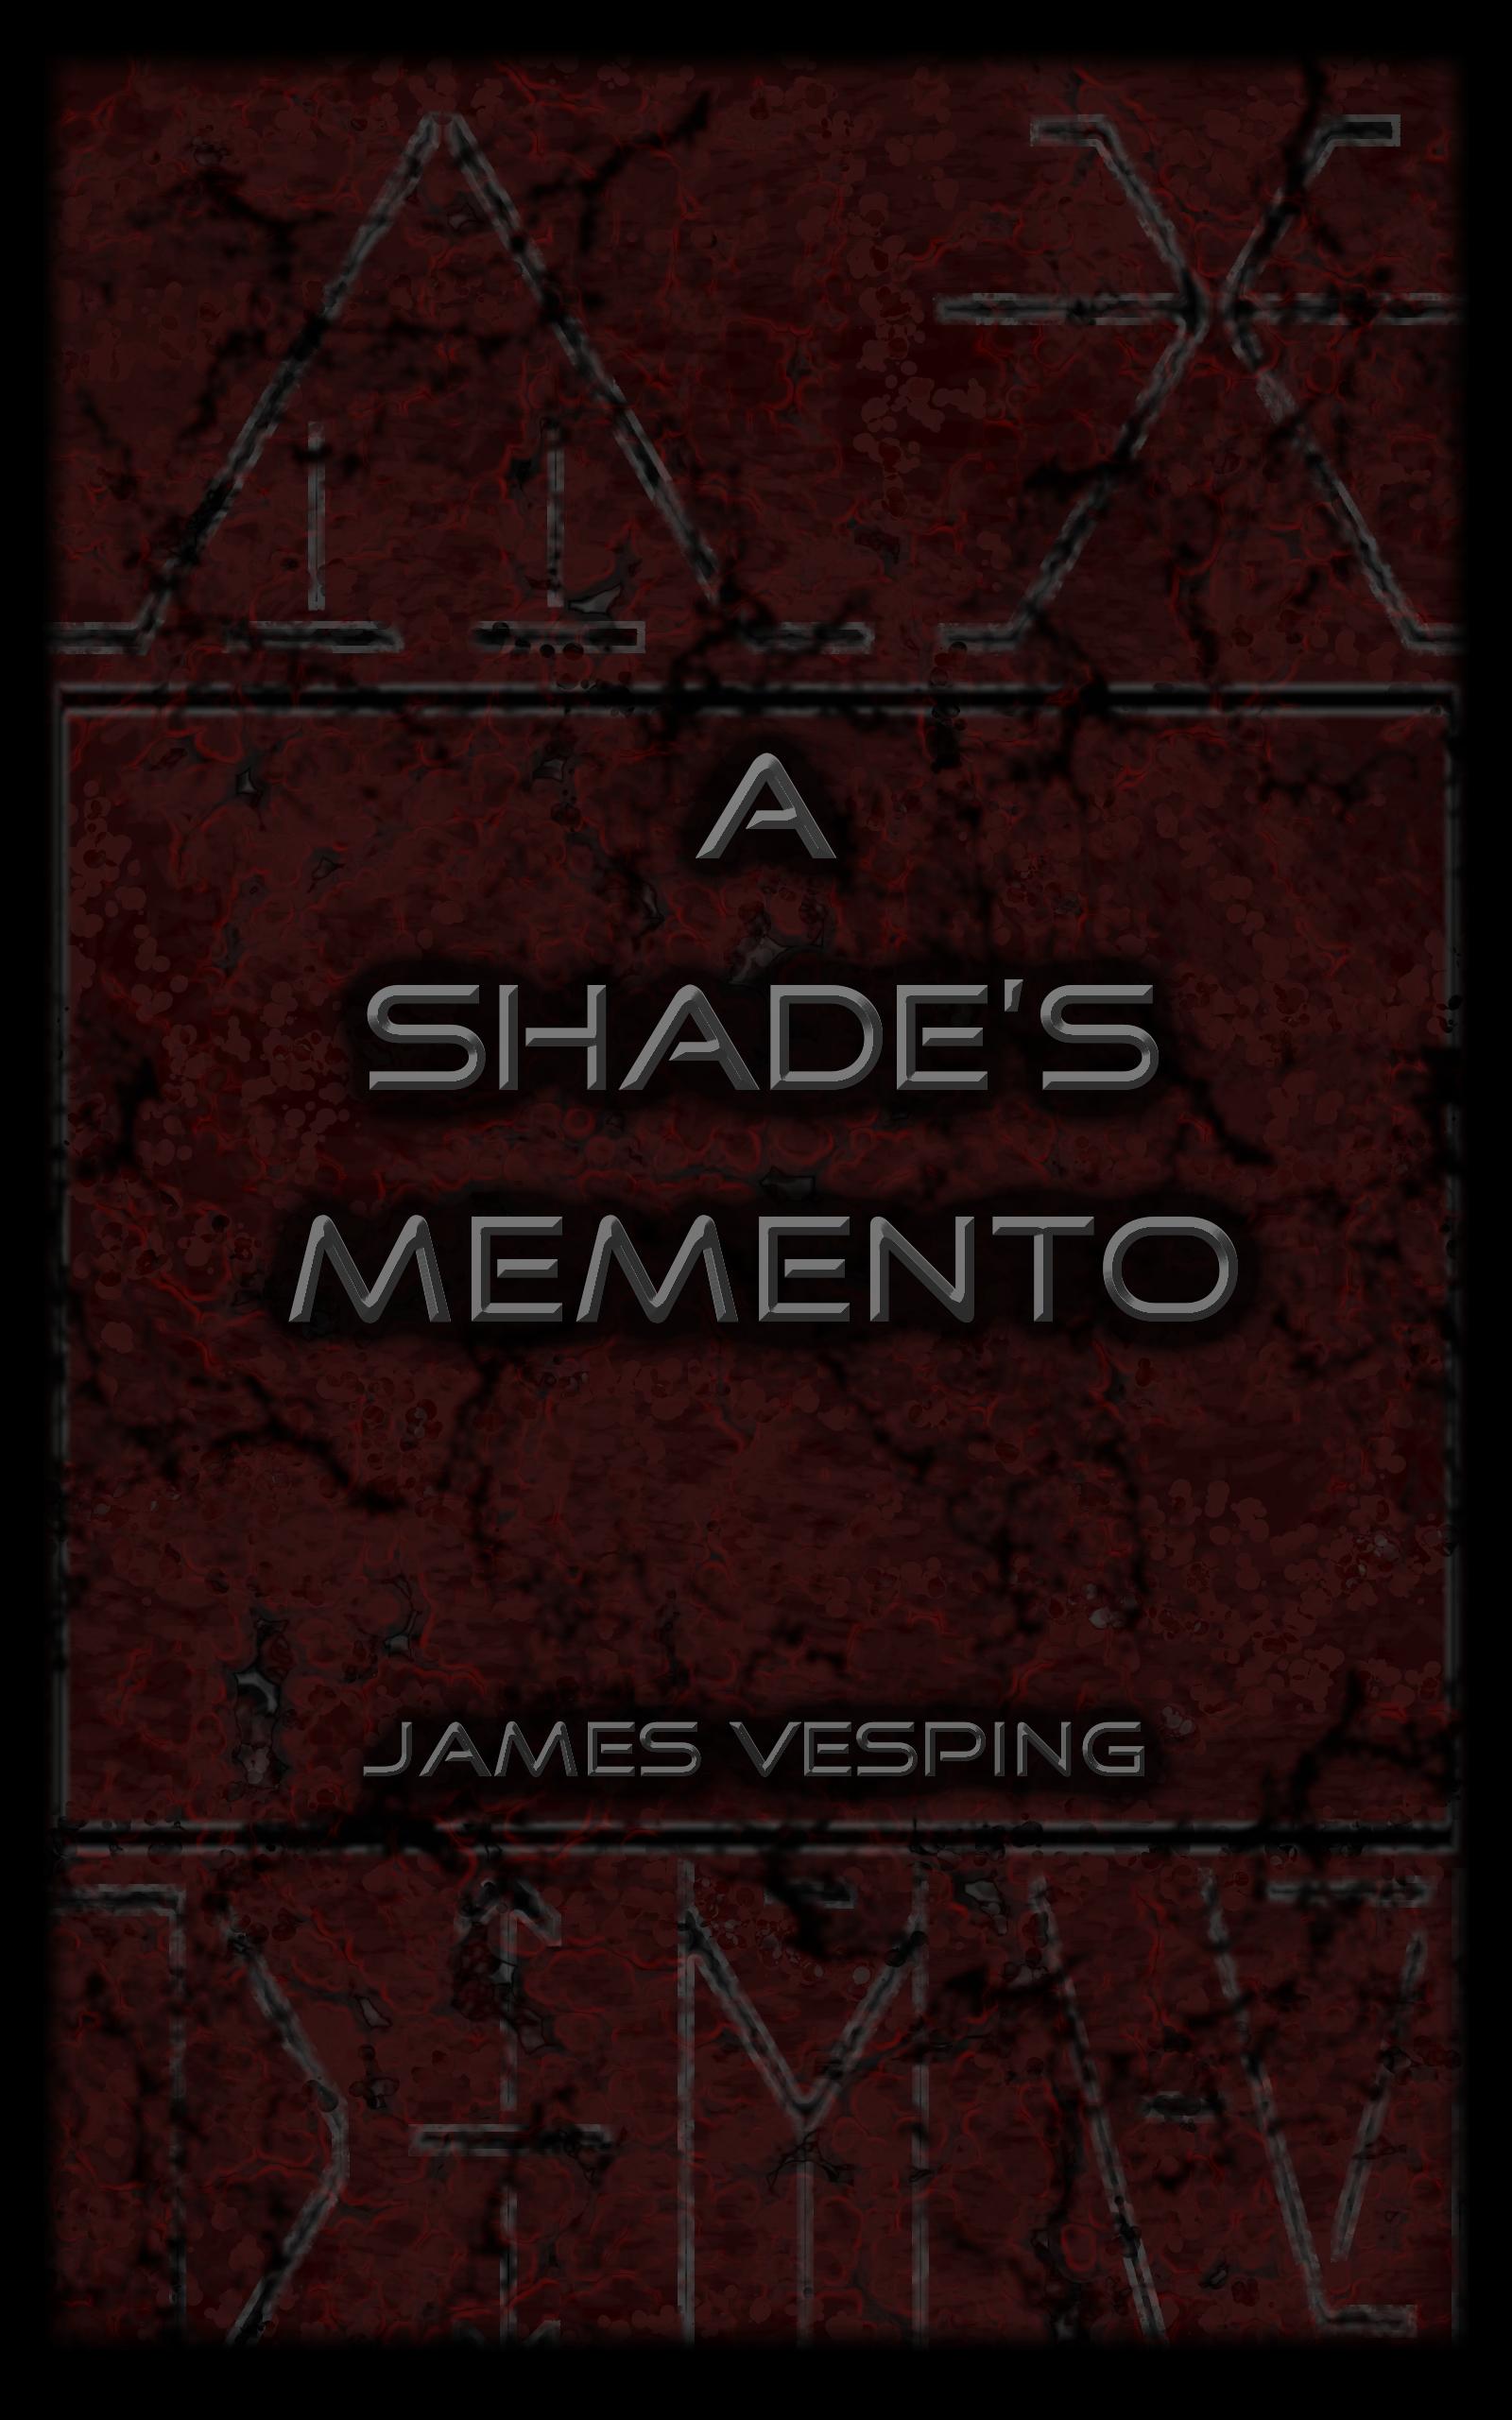 A Shade's Memento